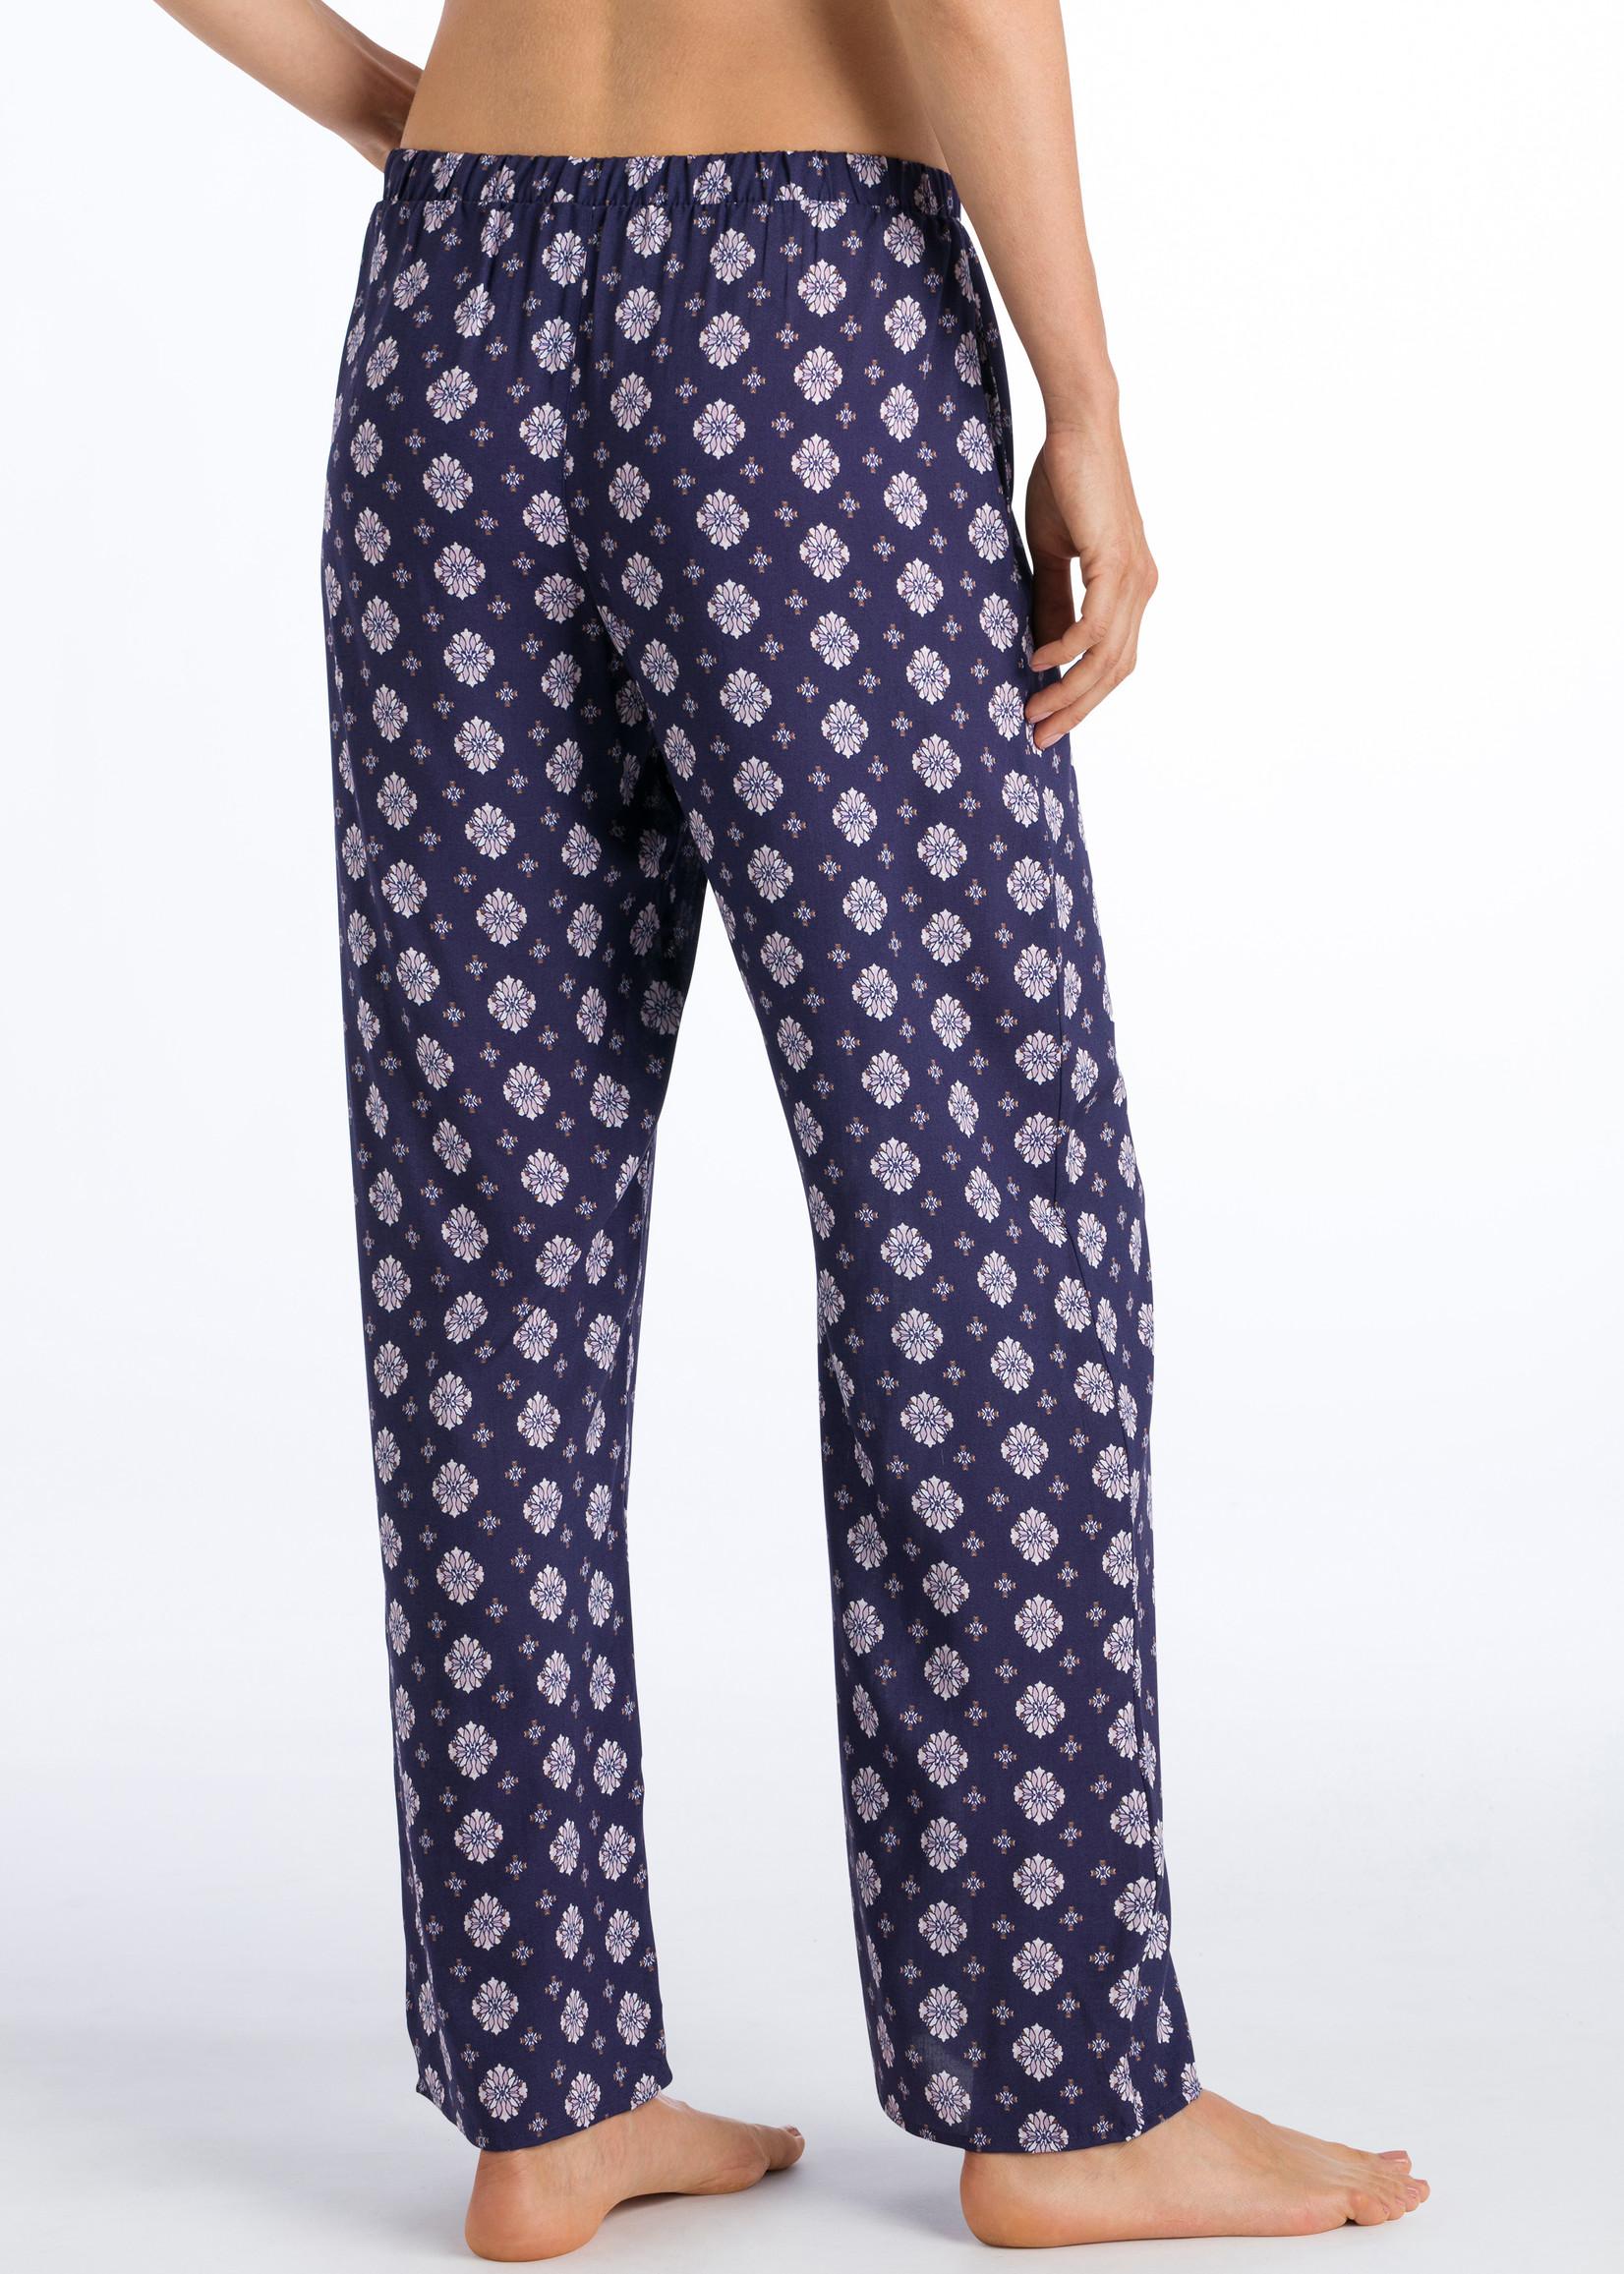 Hanro Sleep & Lounge Pant Set